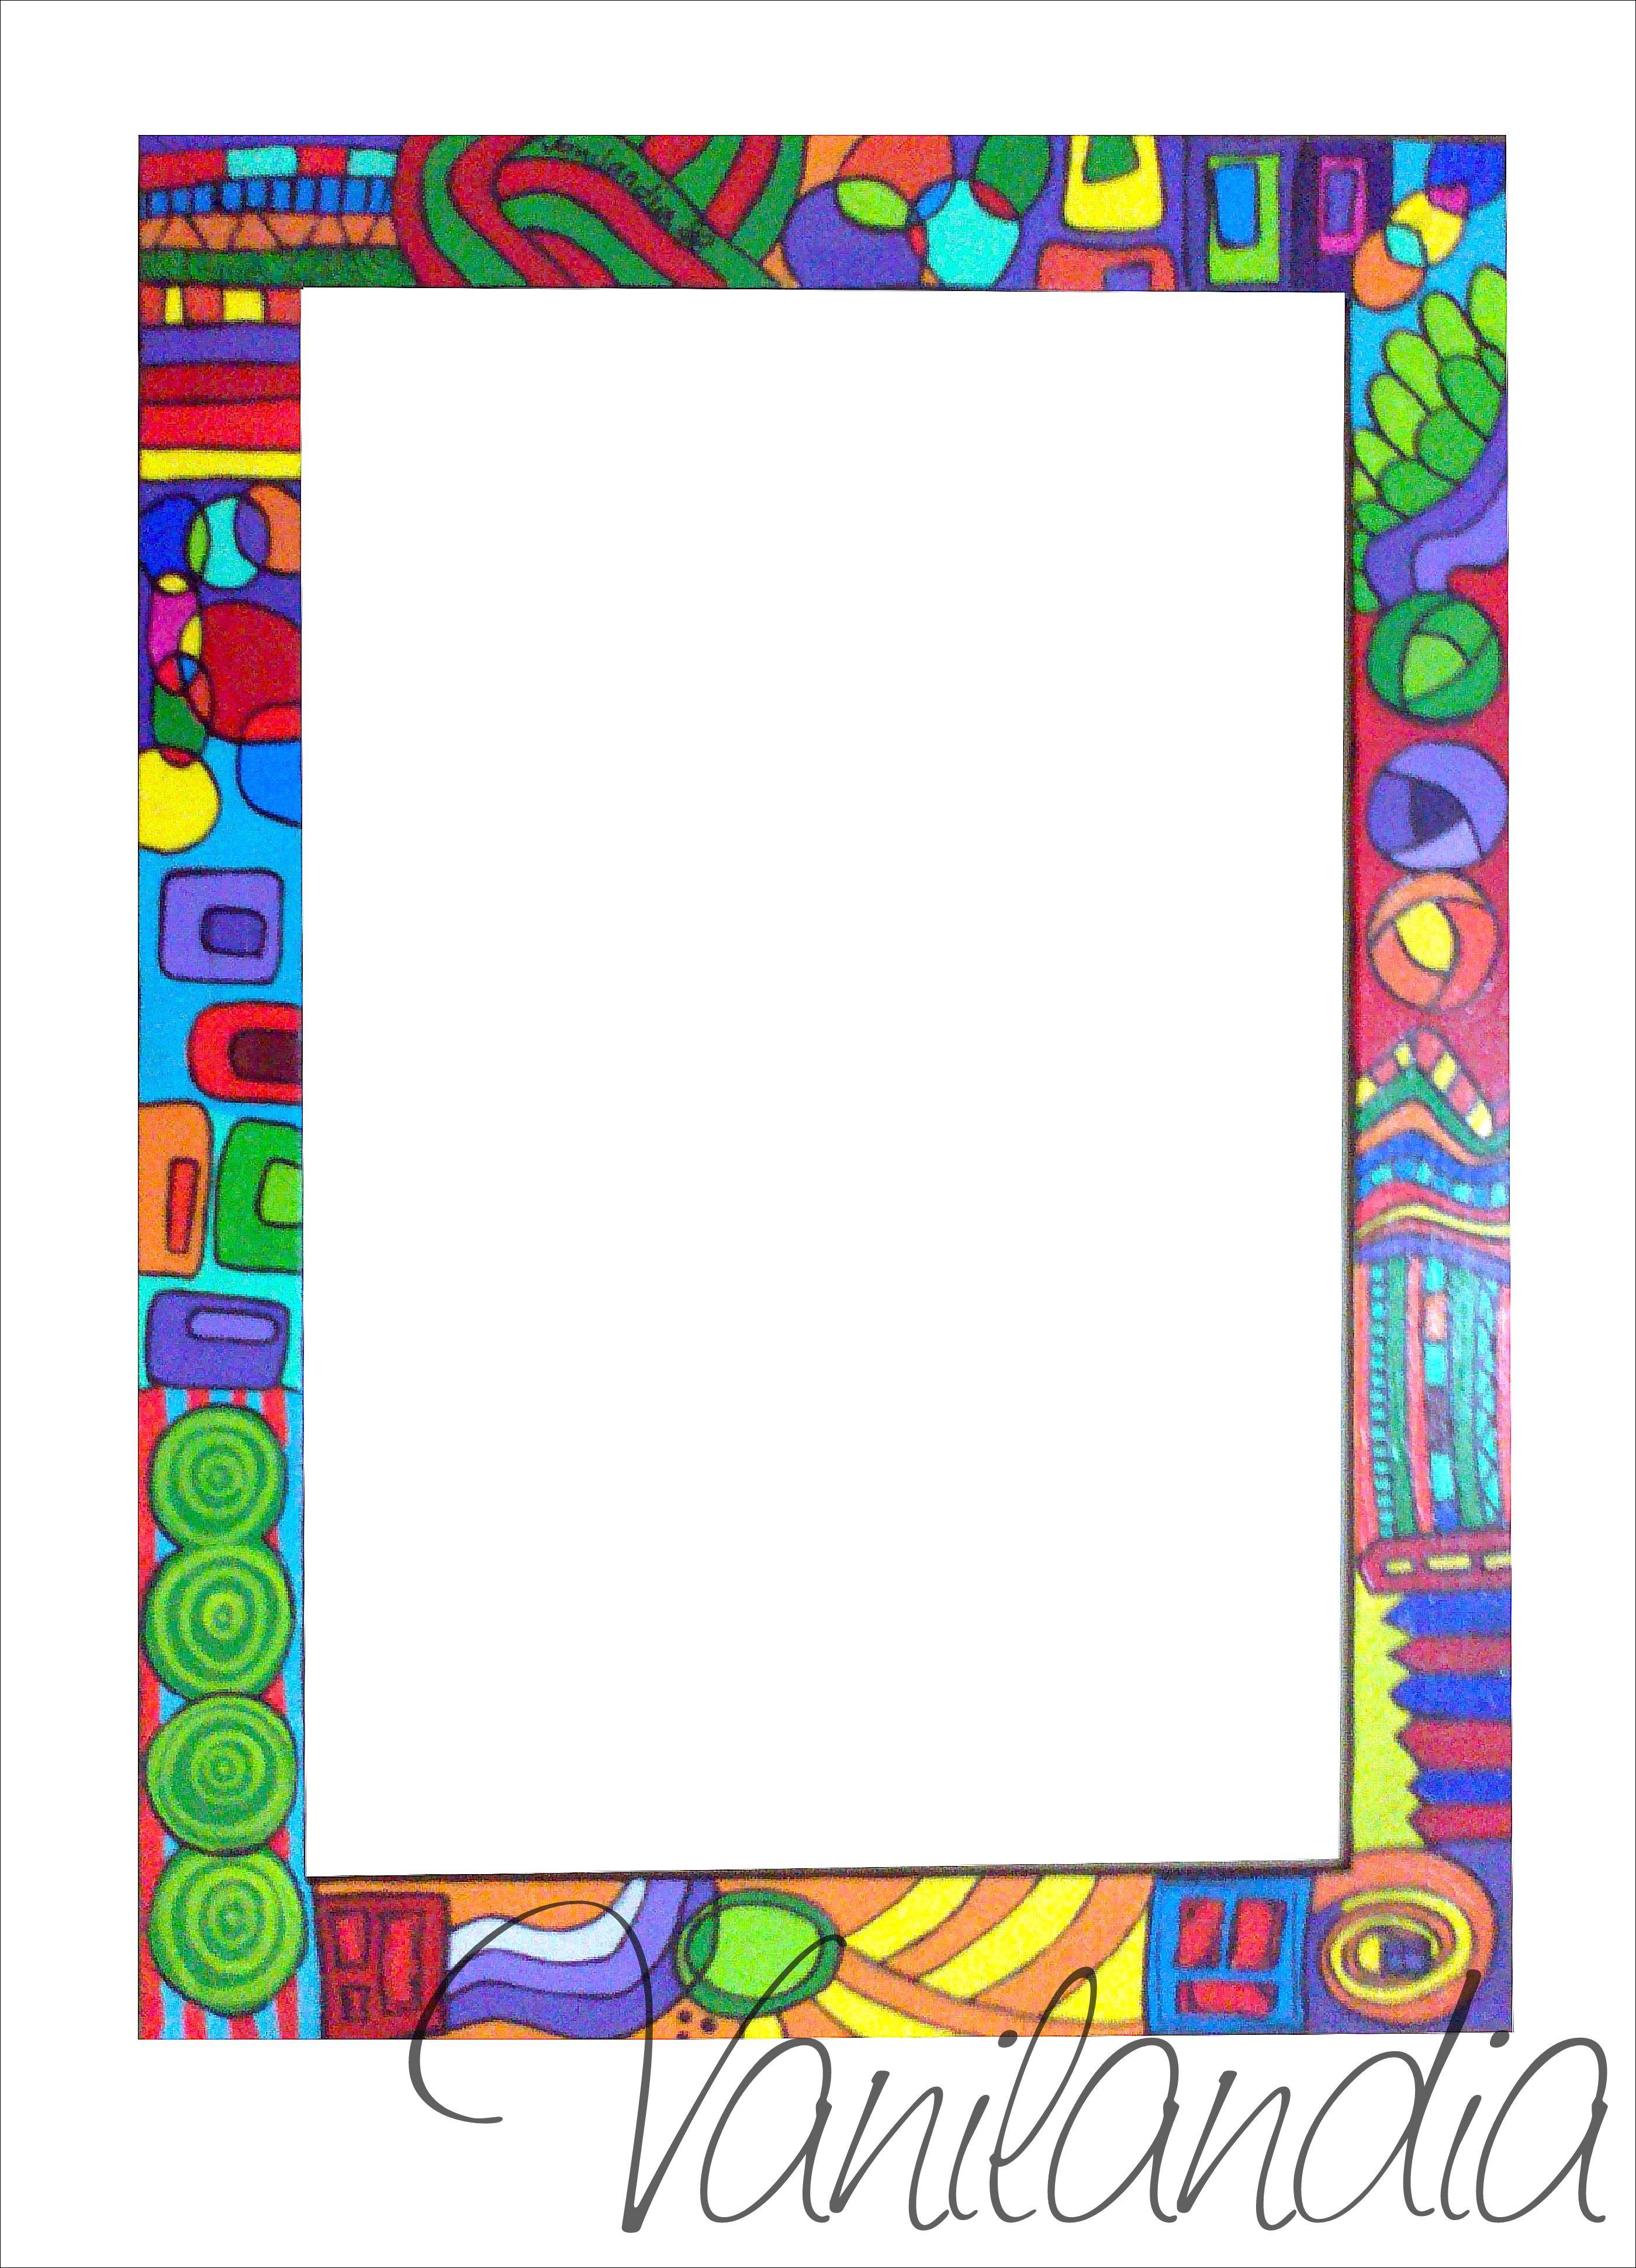 Marco de madera pintado para ba o va con espejo medidas for Espejos para banos con marco de madera